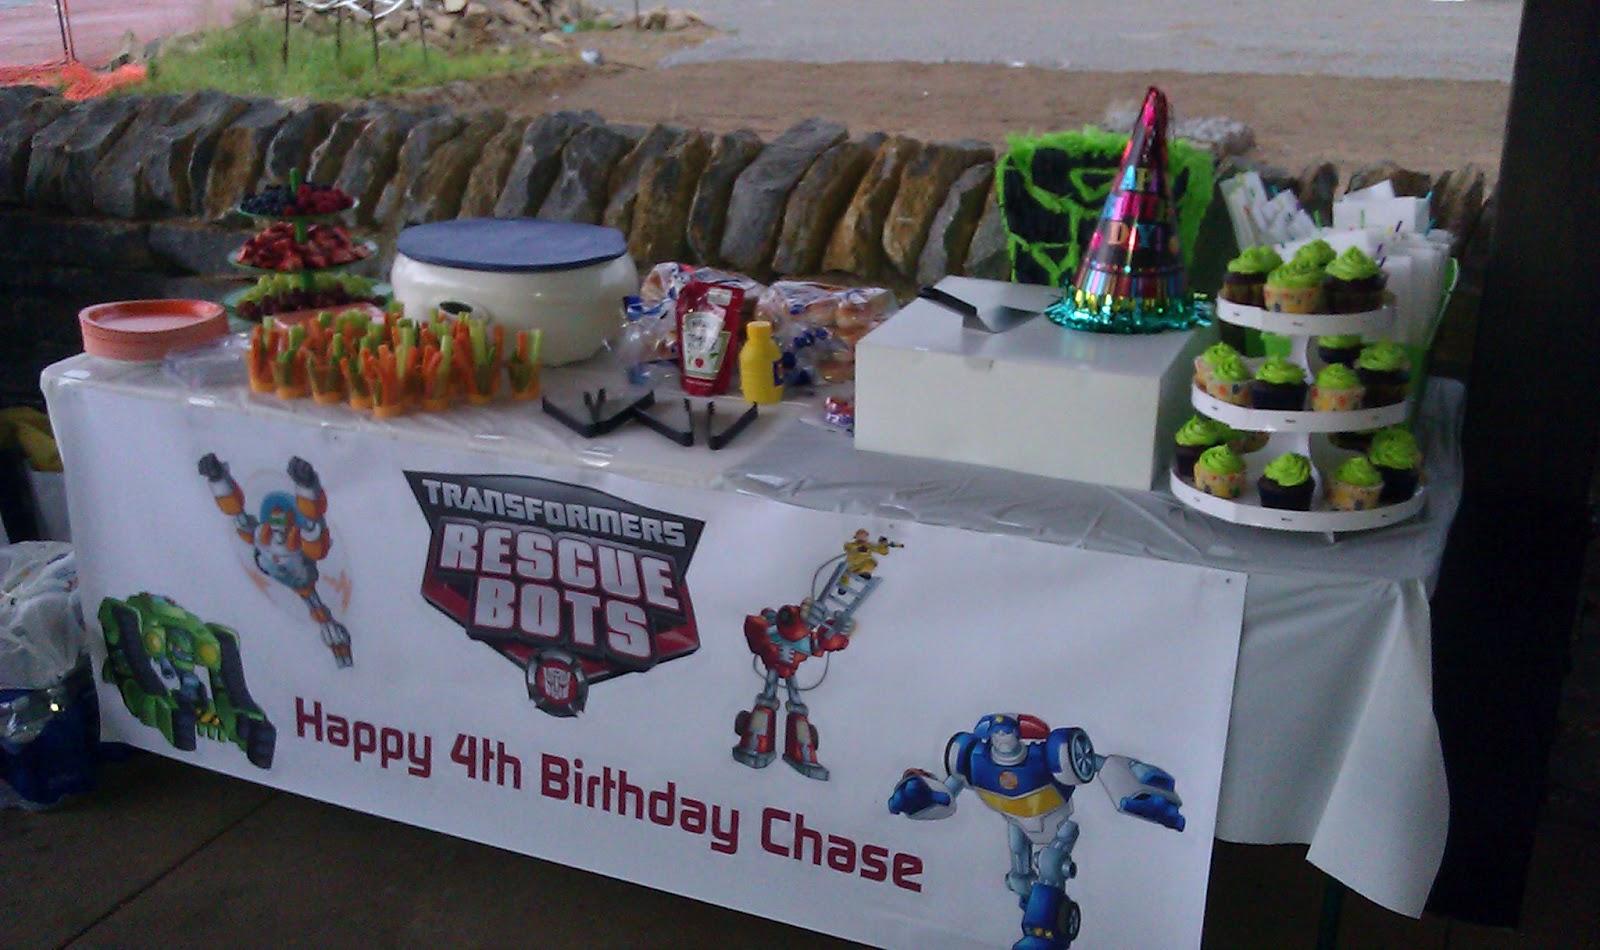 Transformer Rescue Bots Birthday Party